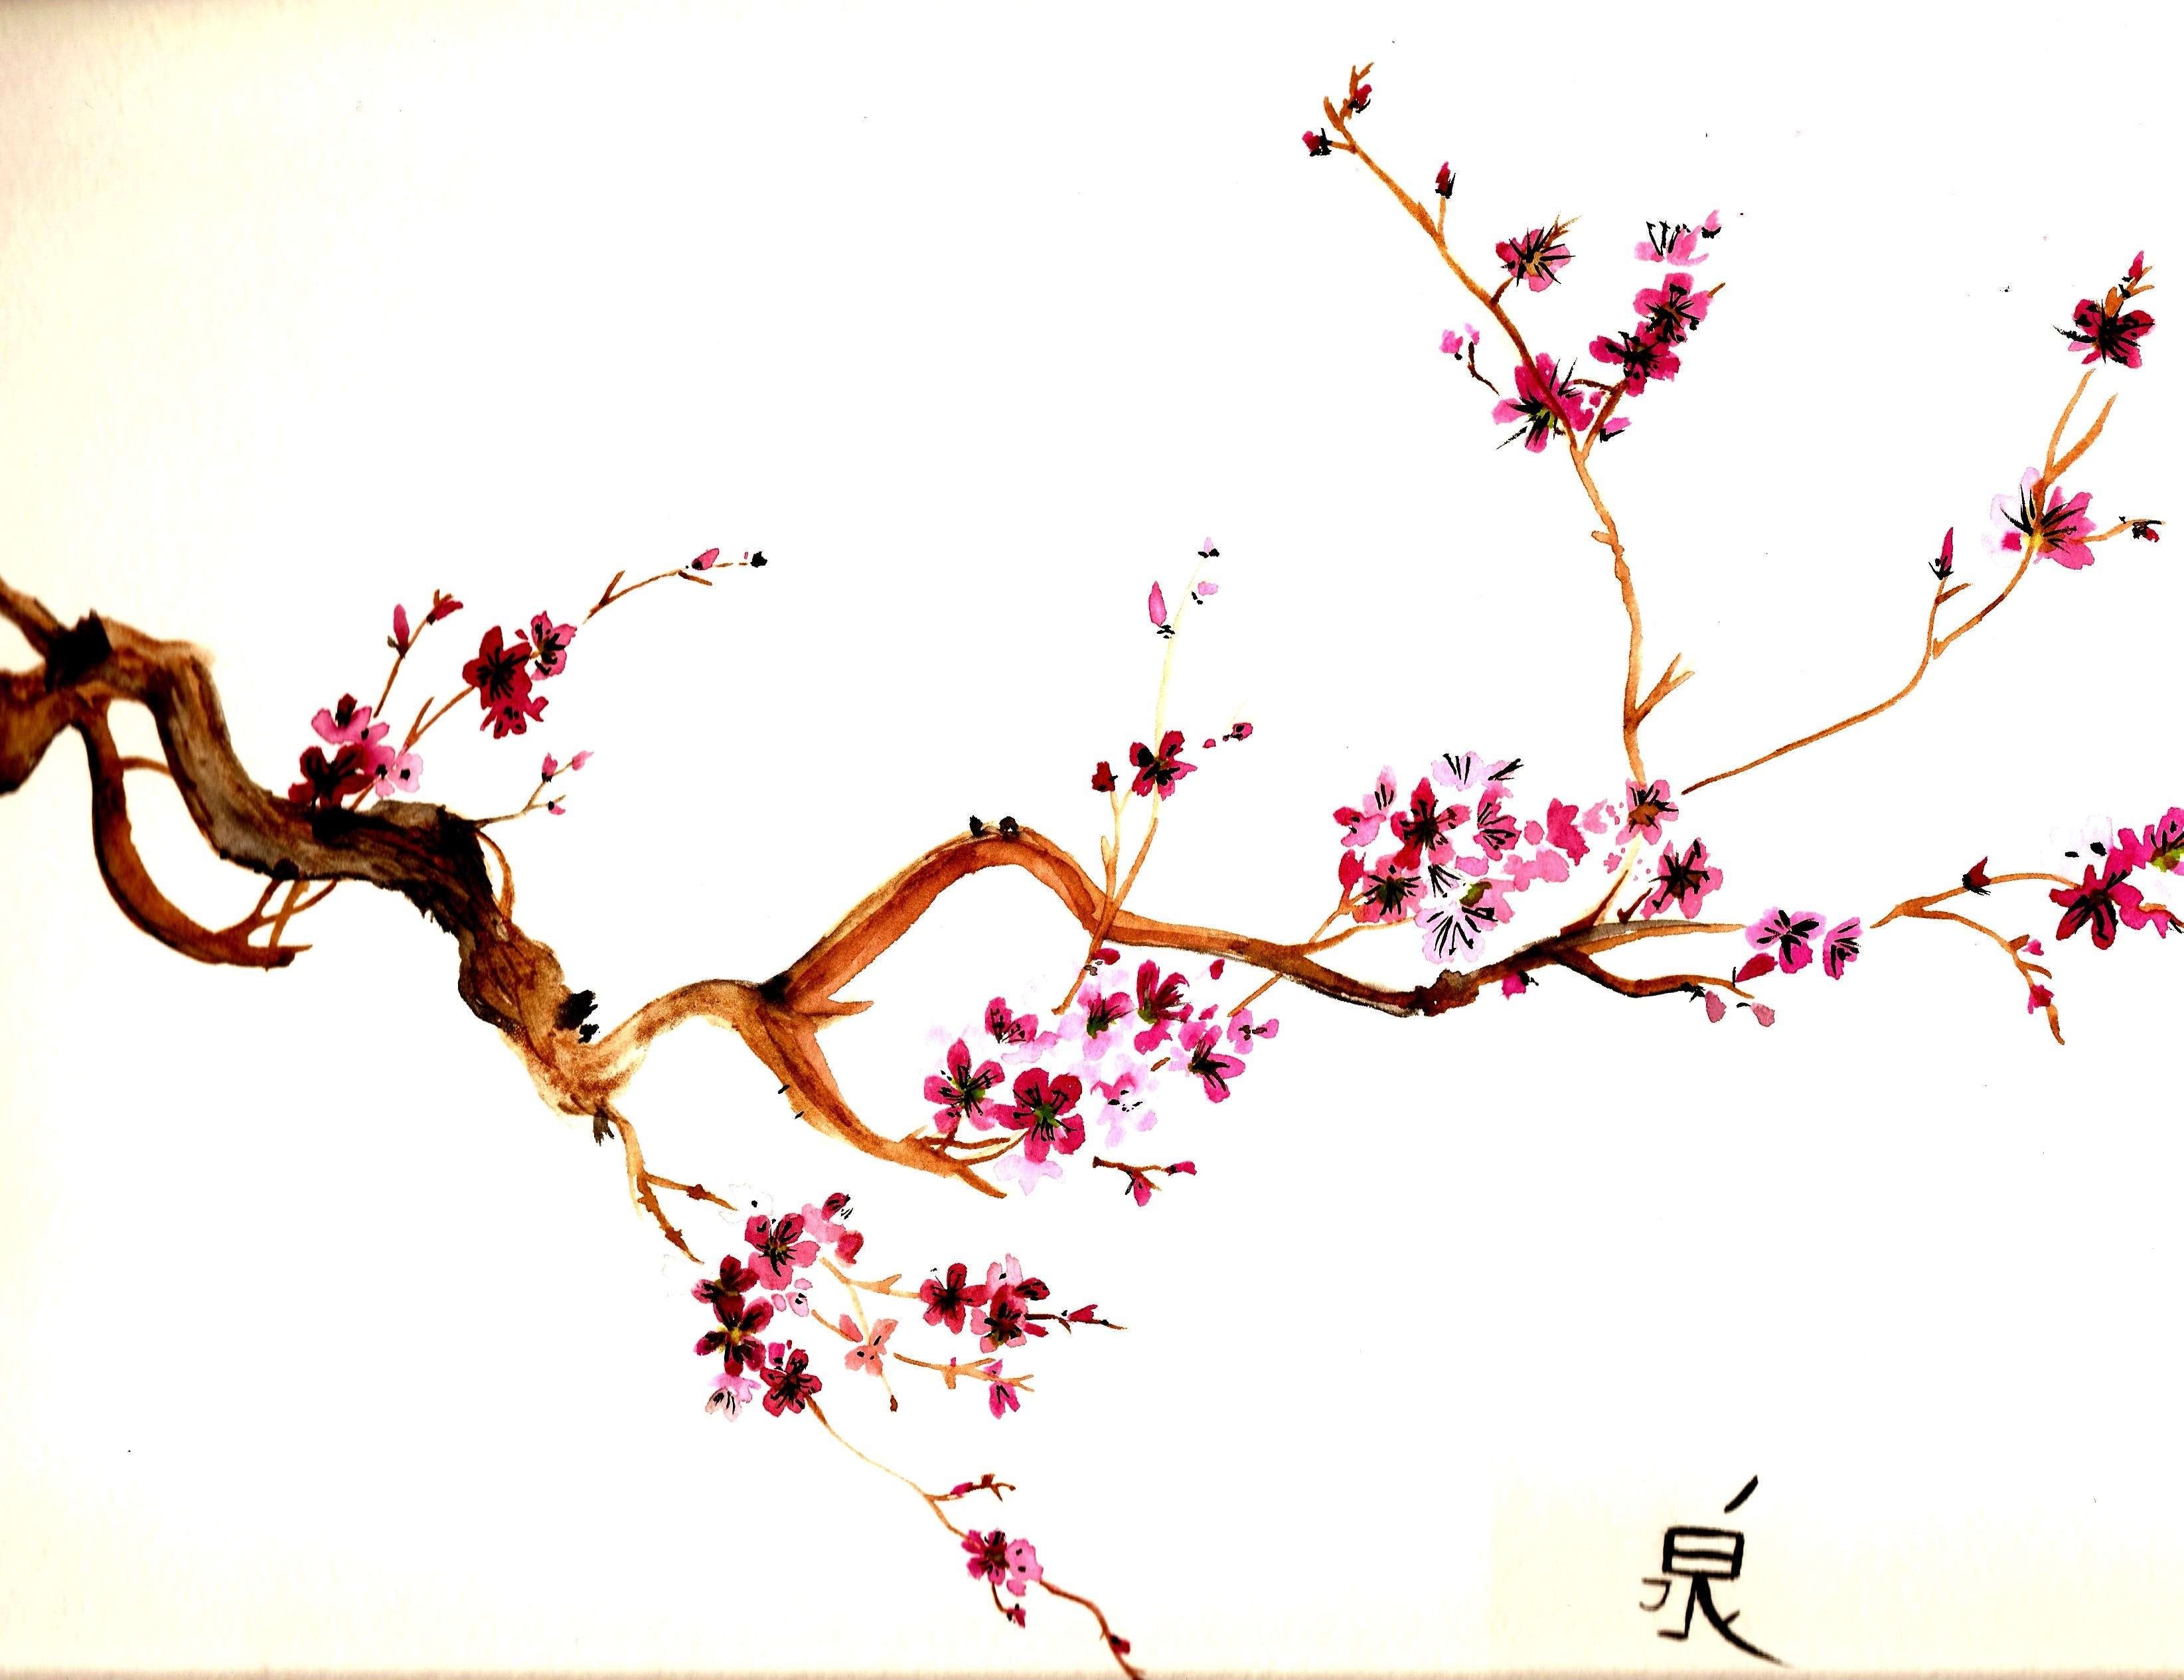 Drawn sakura blossom sakura tree #watercolor #Cherry #blossom #watercolor My